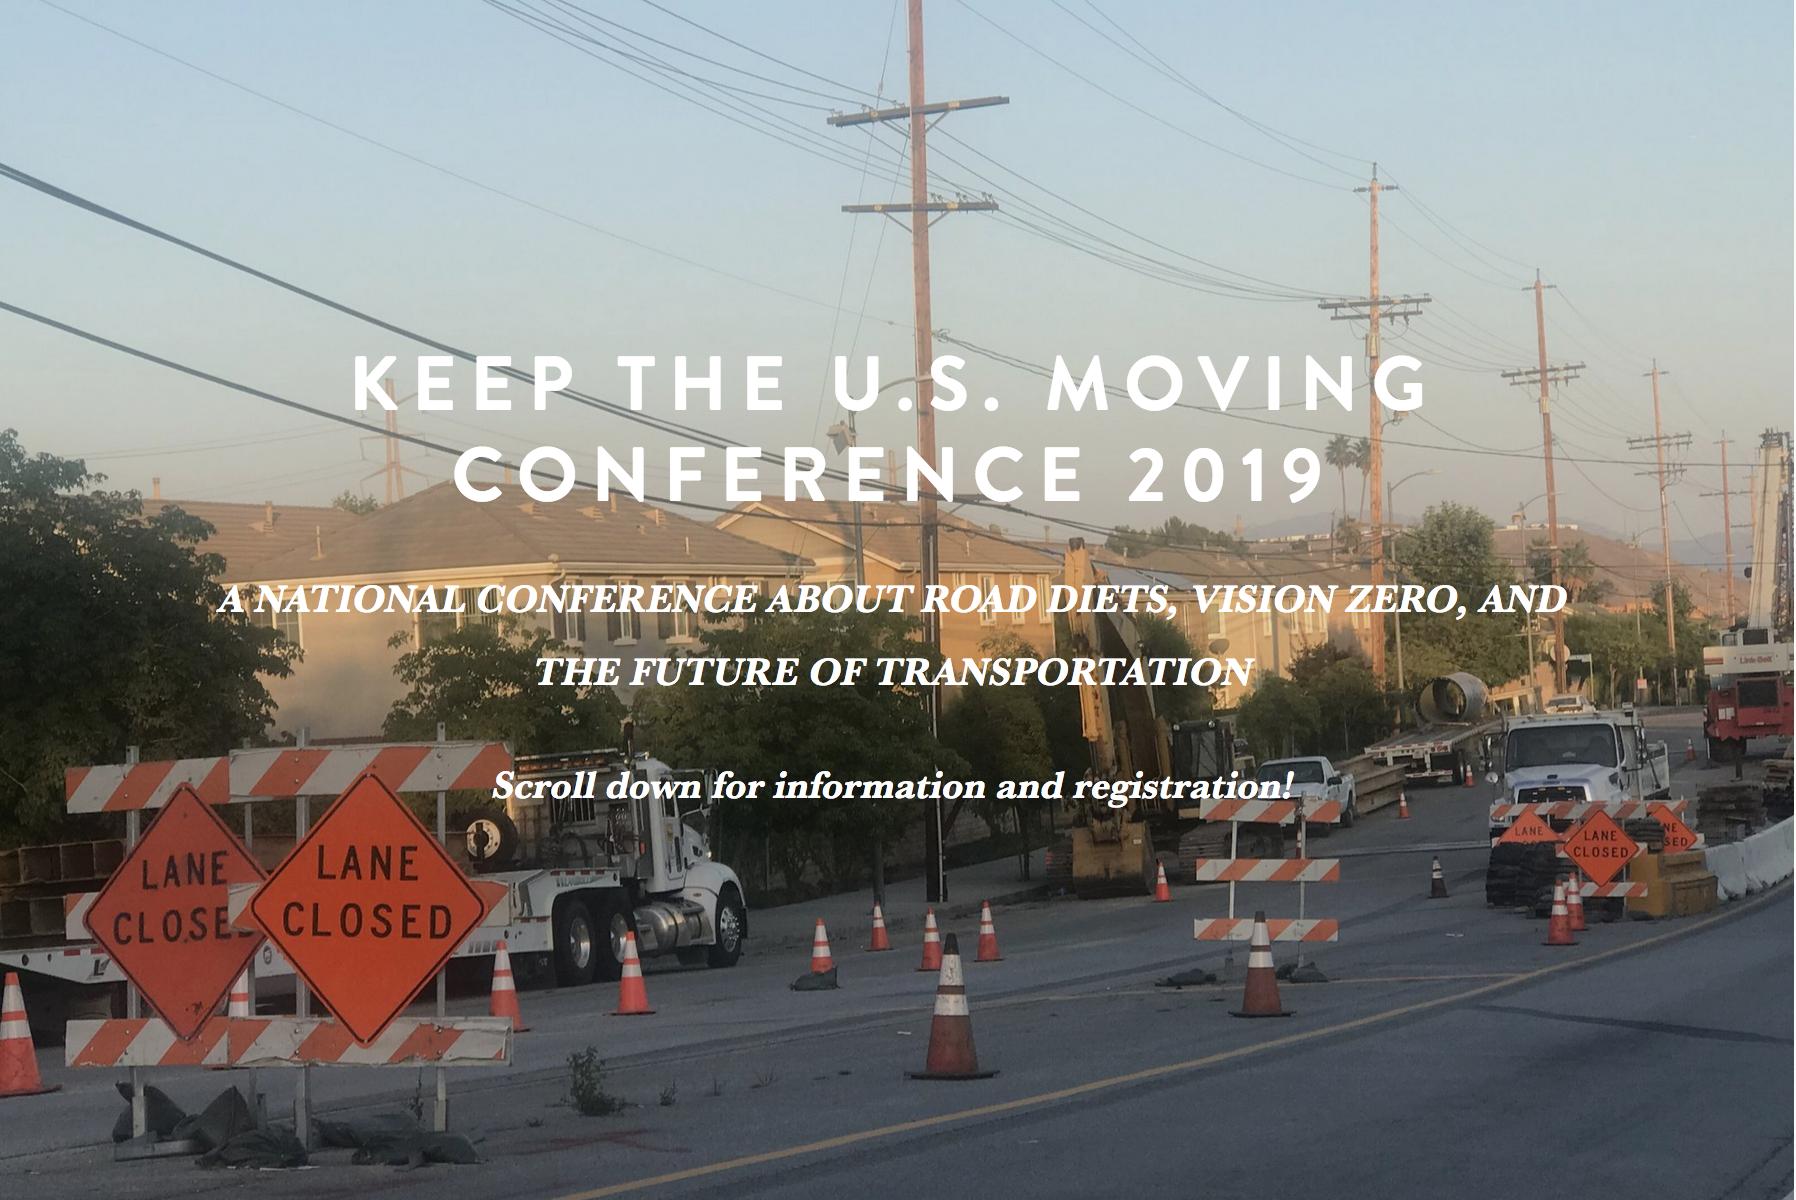 keep the u.s. moving 2019 -